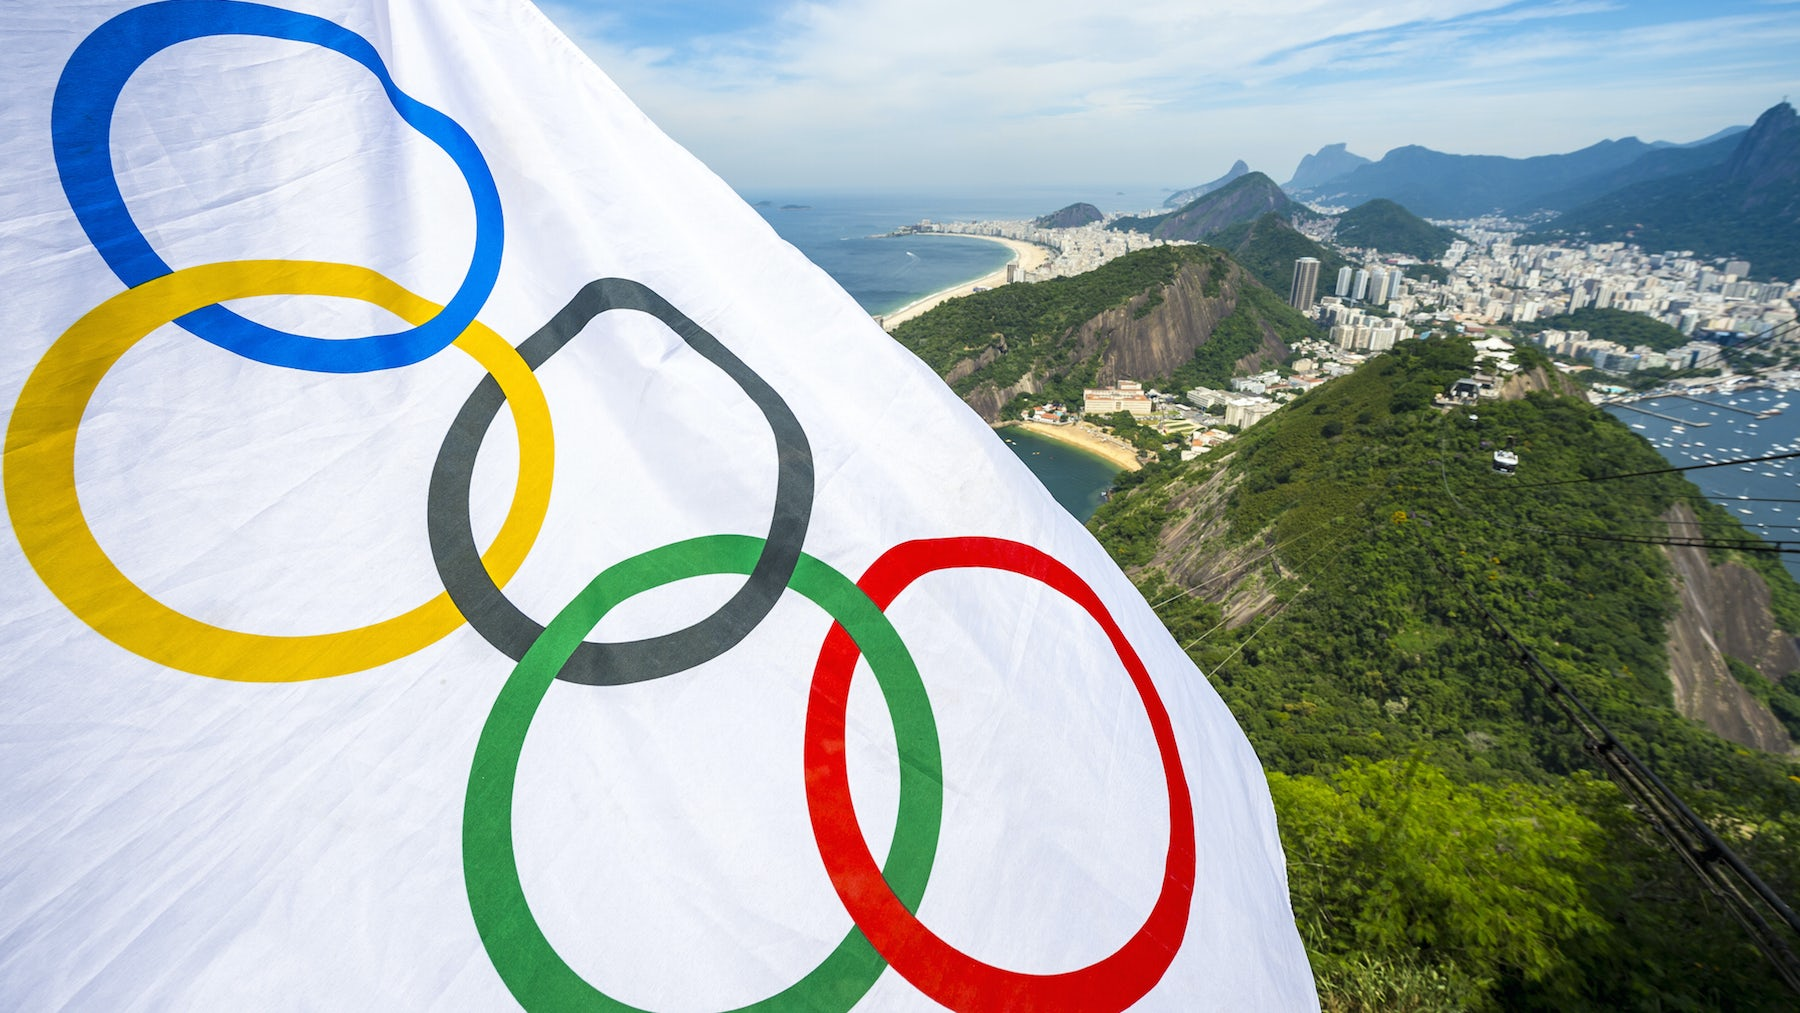 Rio de Janeiro | Source: Shutterstock